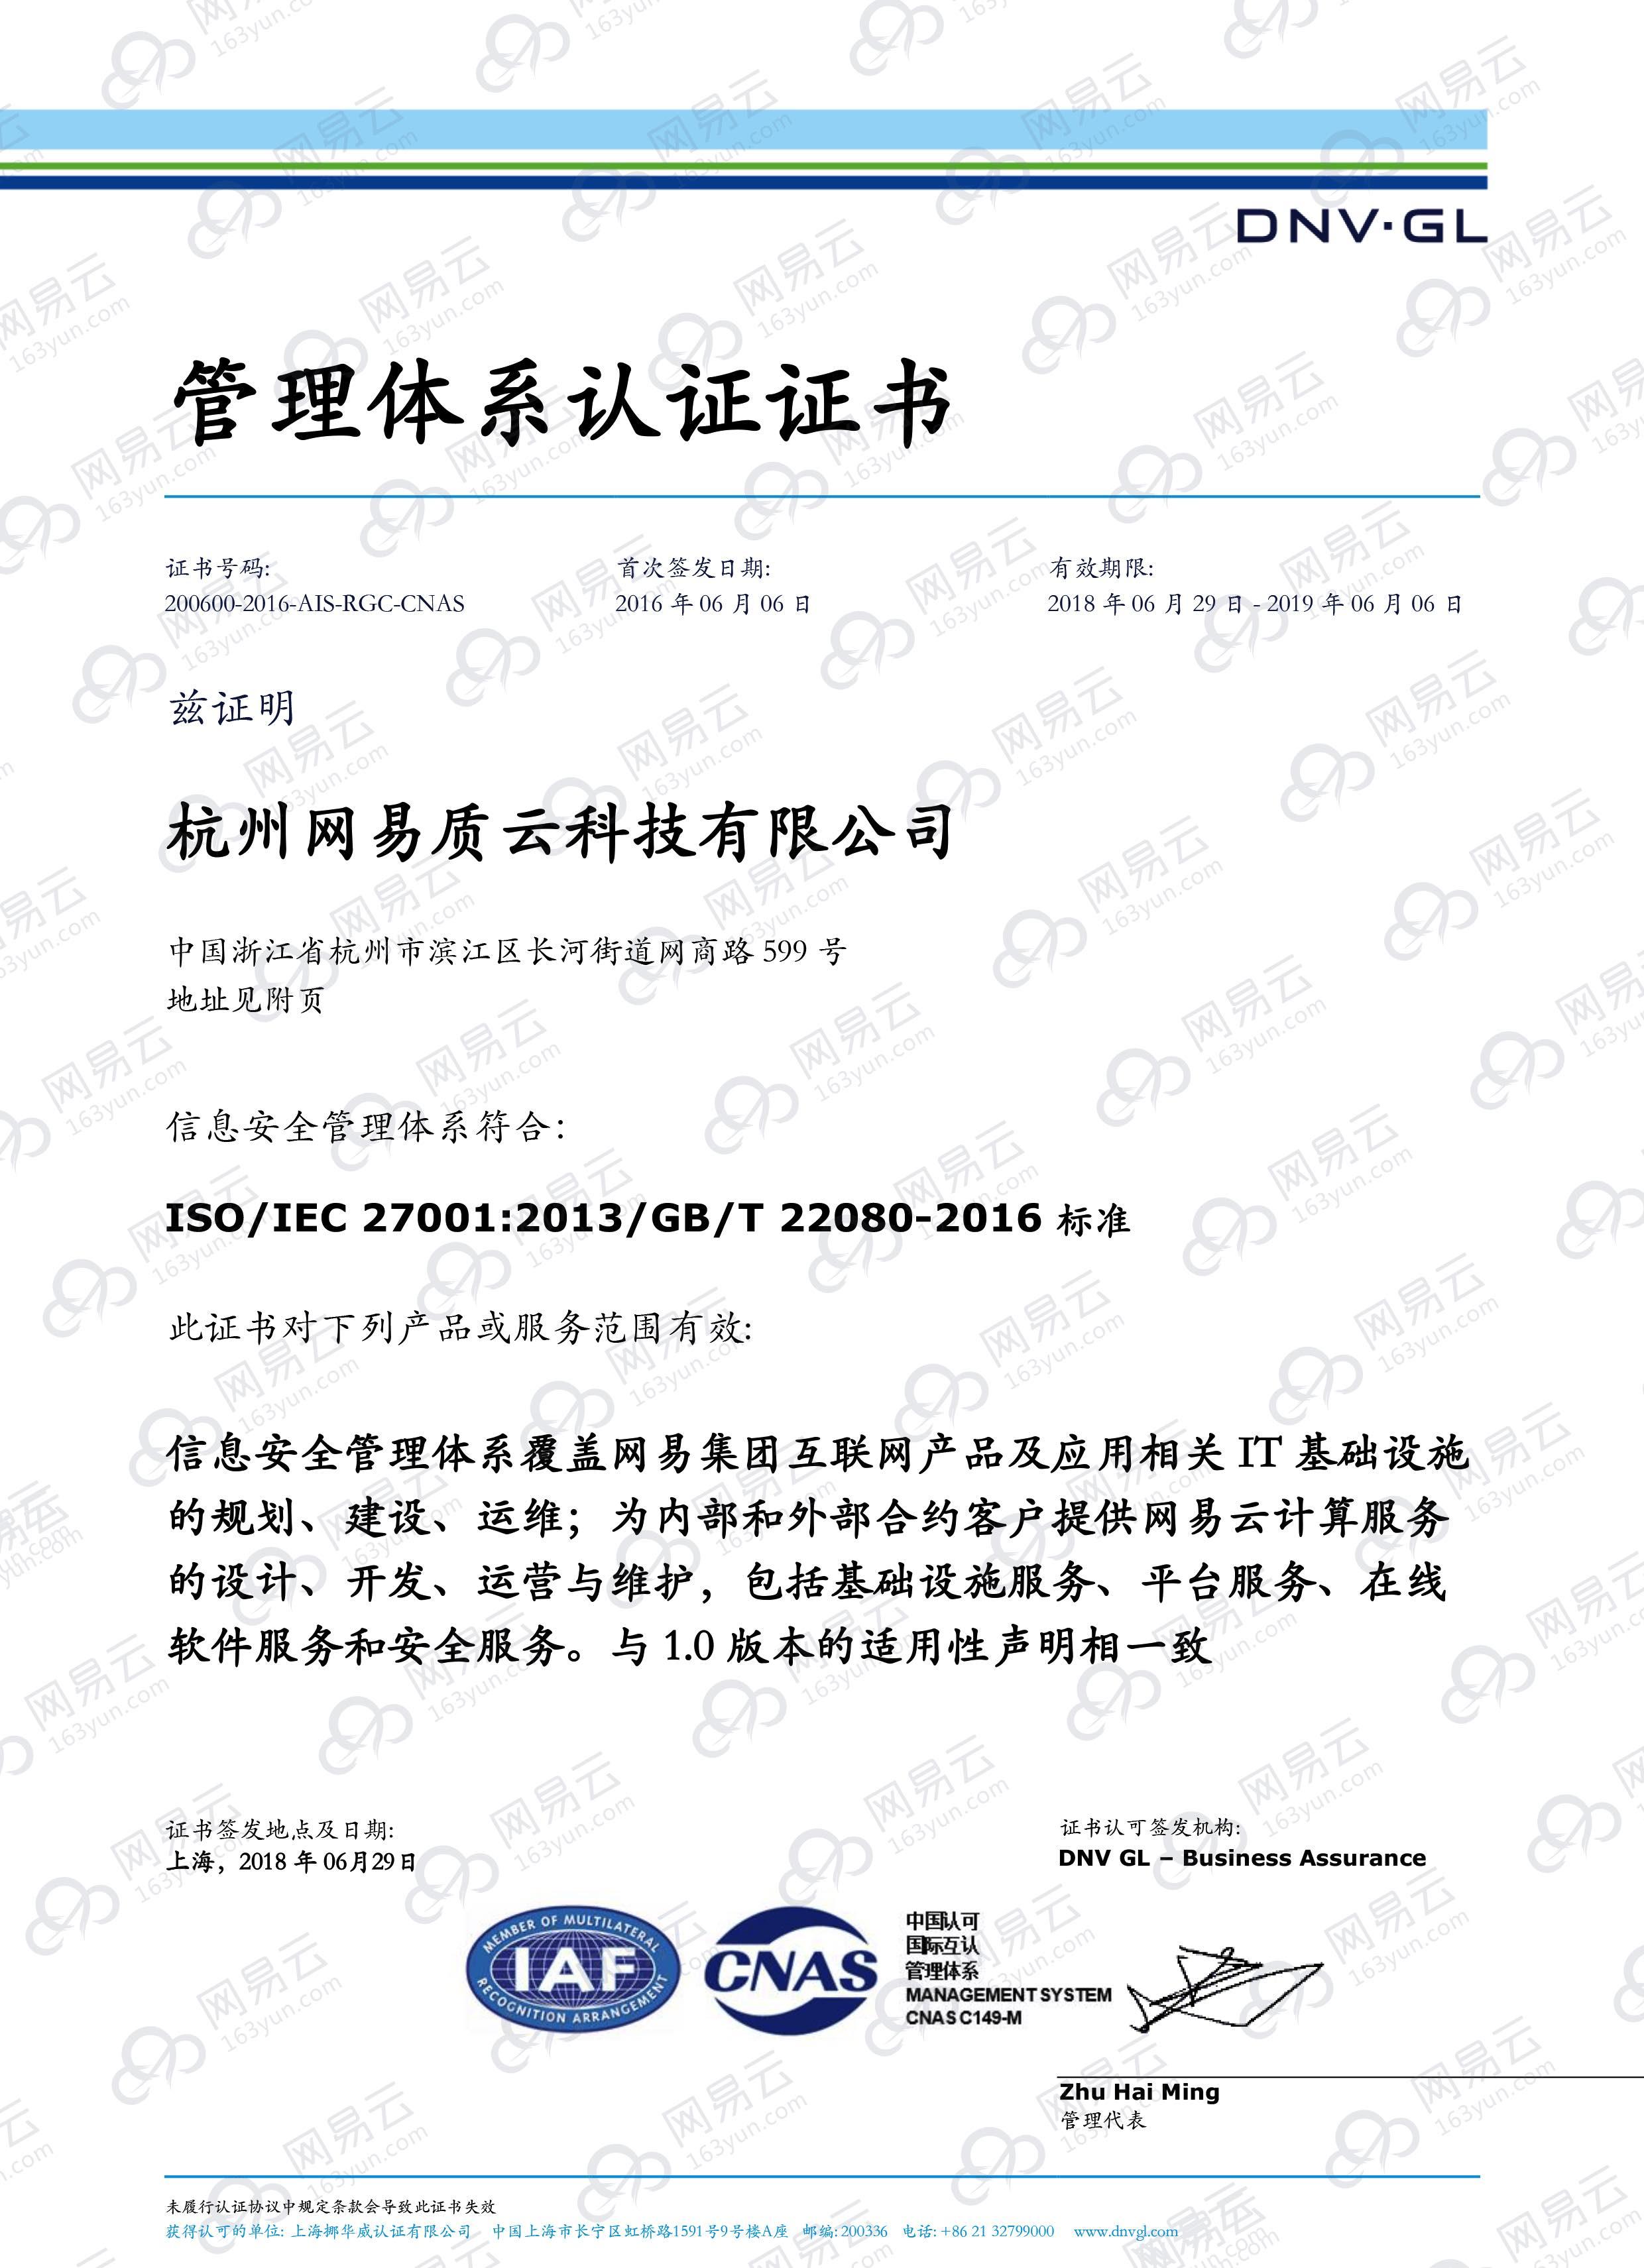 ISO27001-CNAS